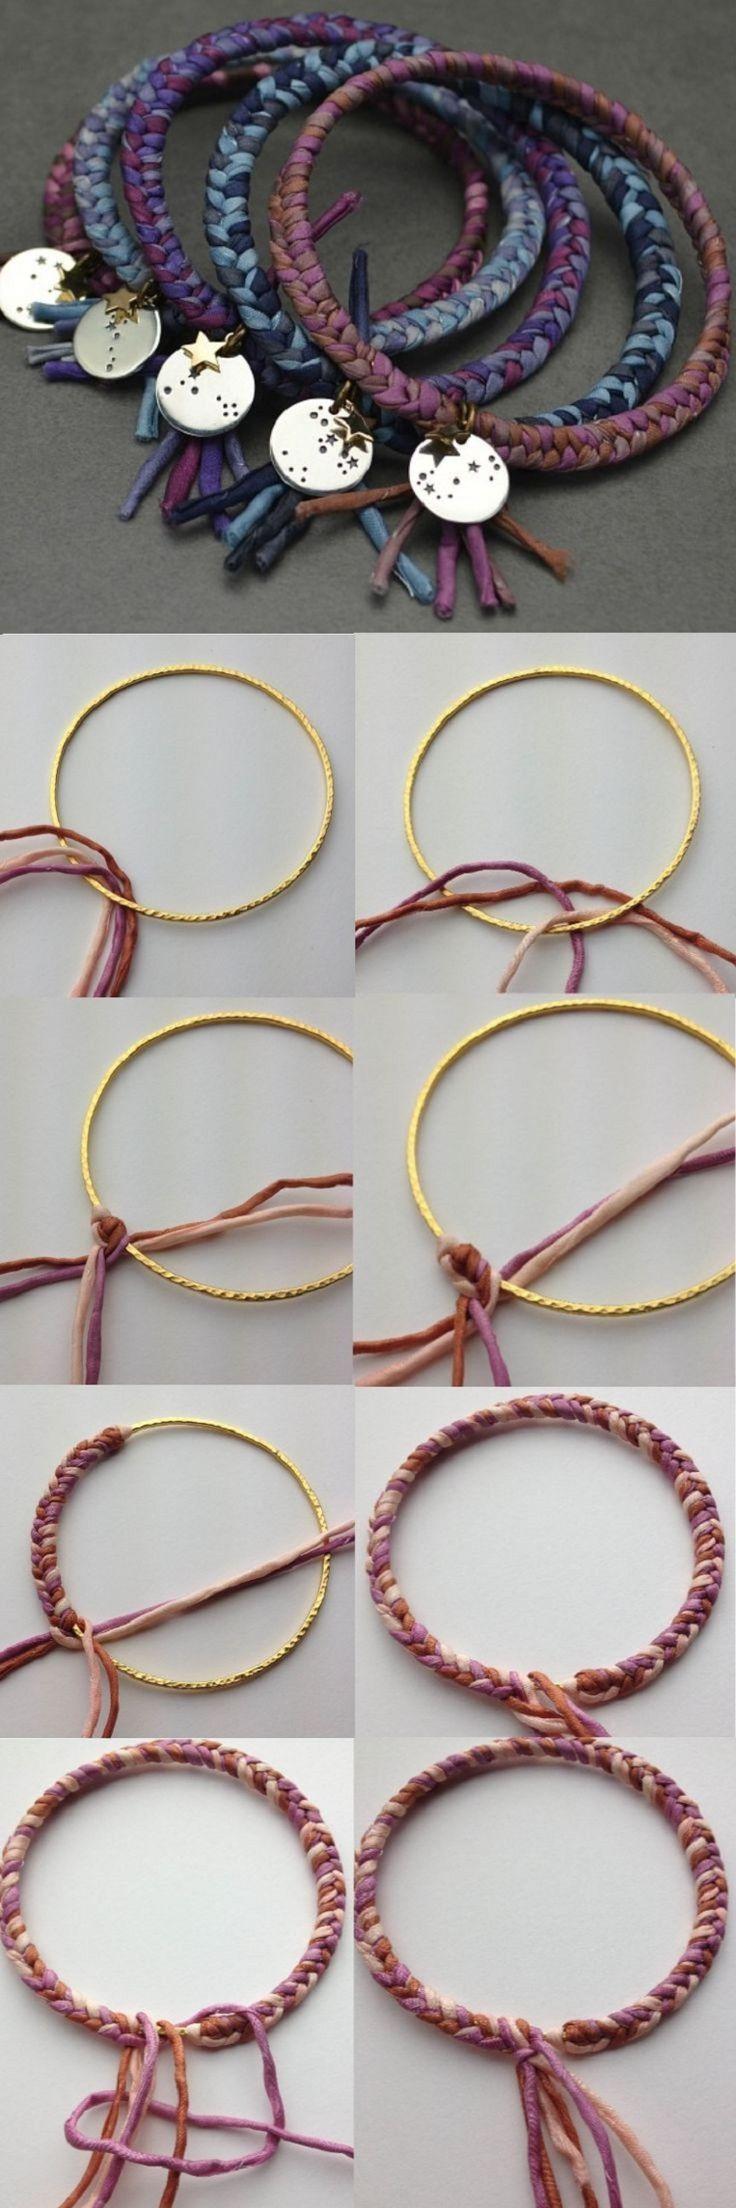 Photo of Make jewelry yourself … # make # jewelry # yourself